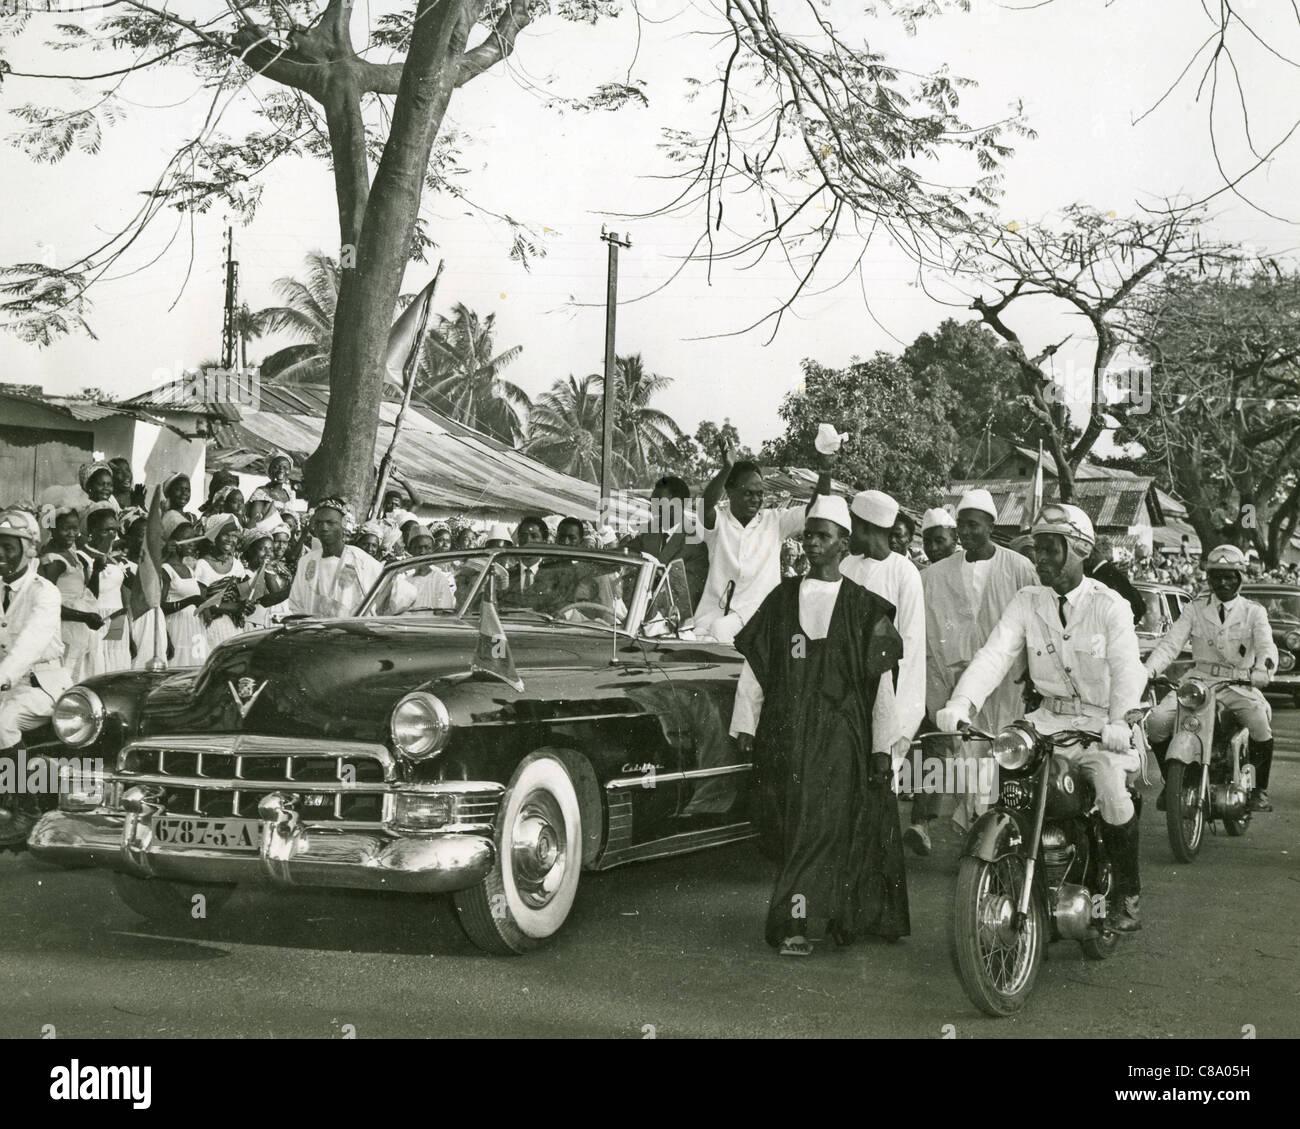 KWAME NKRUMAH (1909-1972) Ghanian political leader - Stock Image